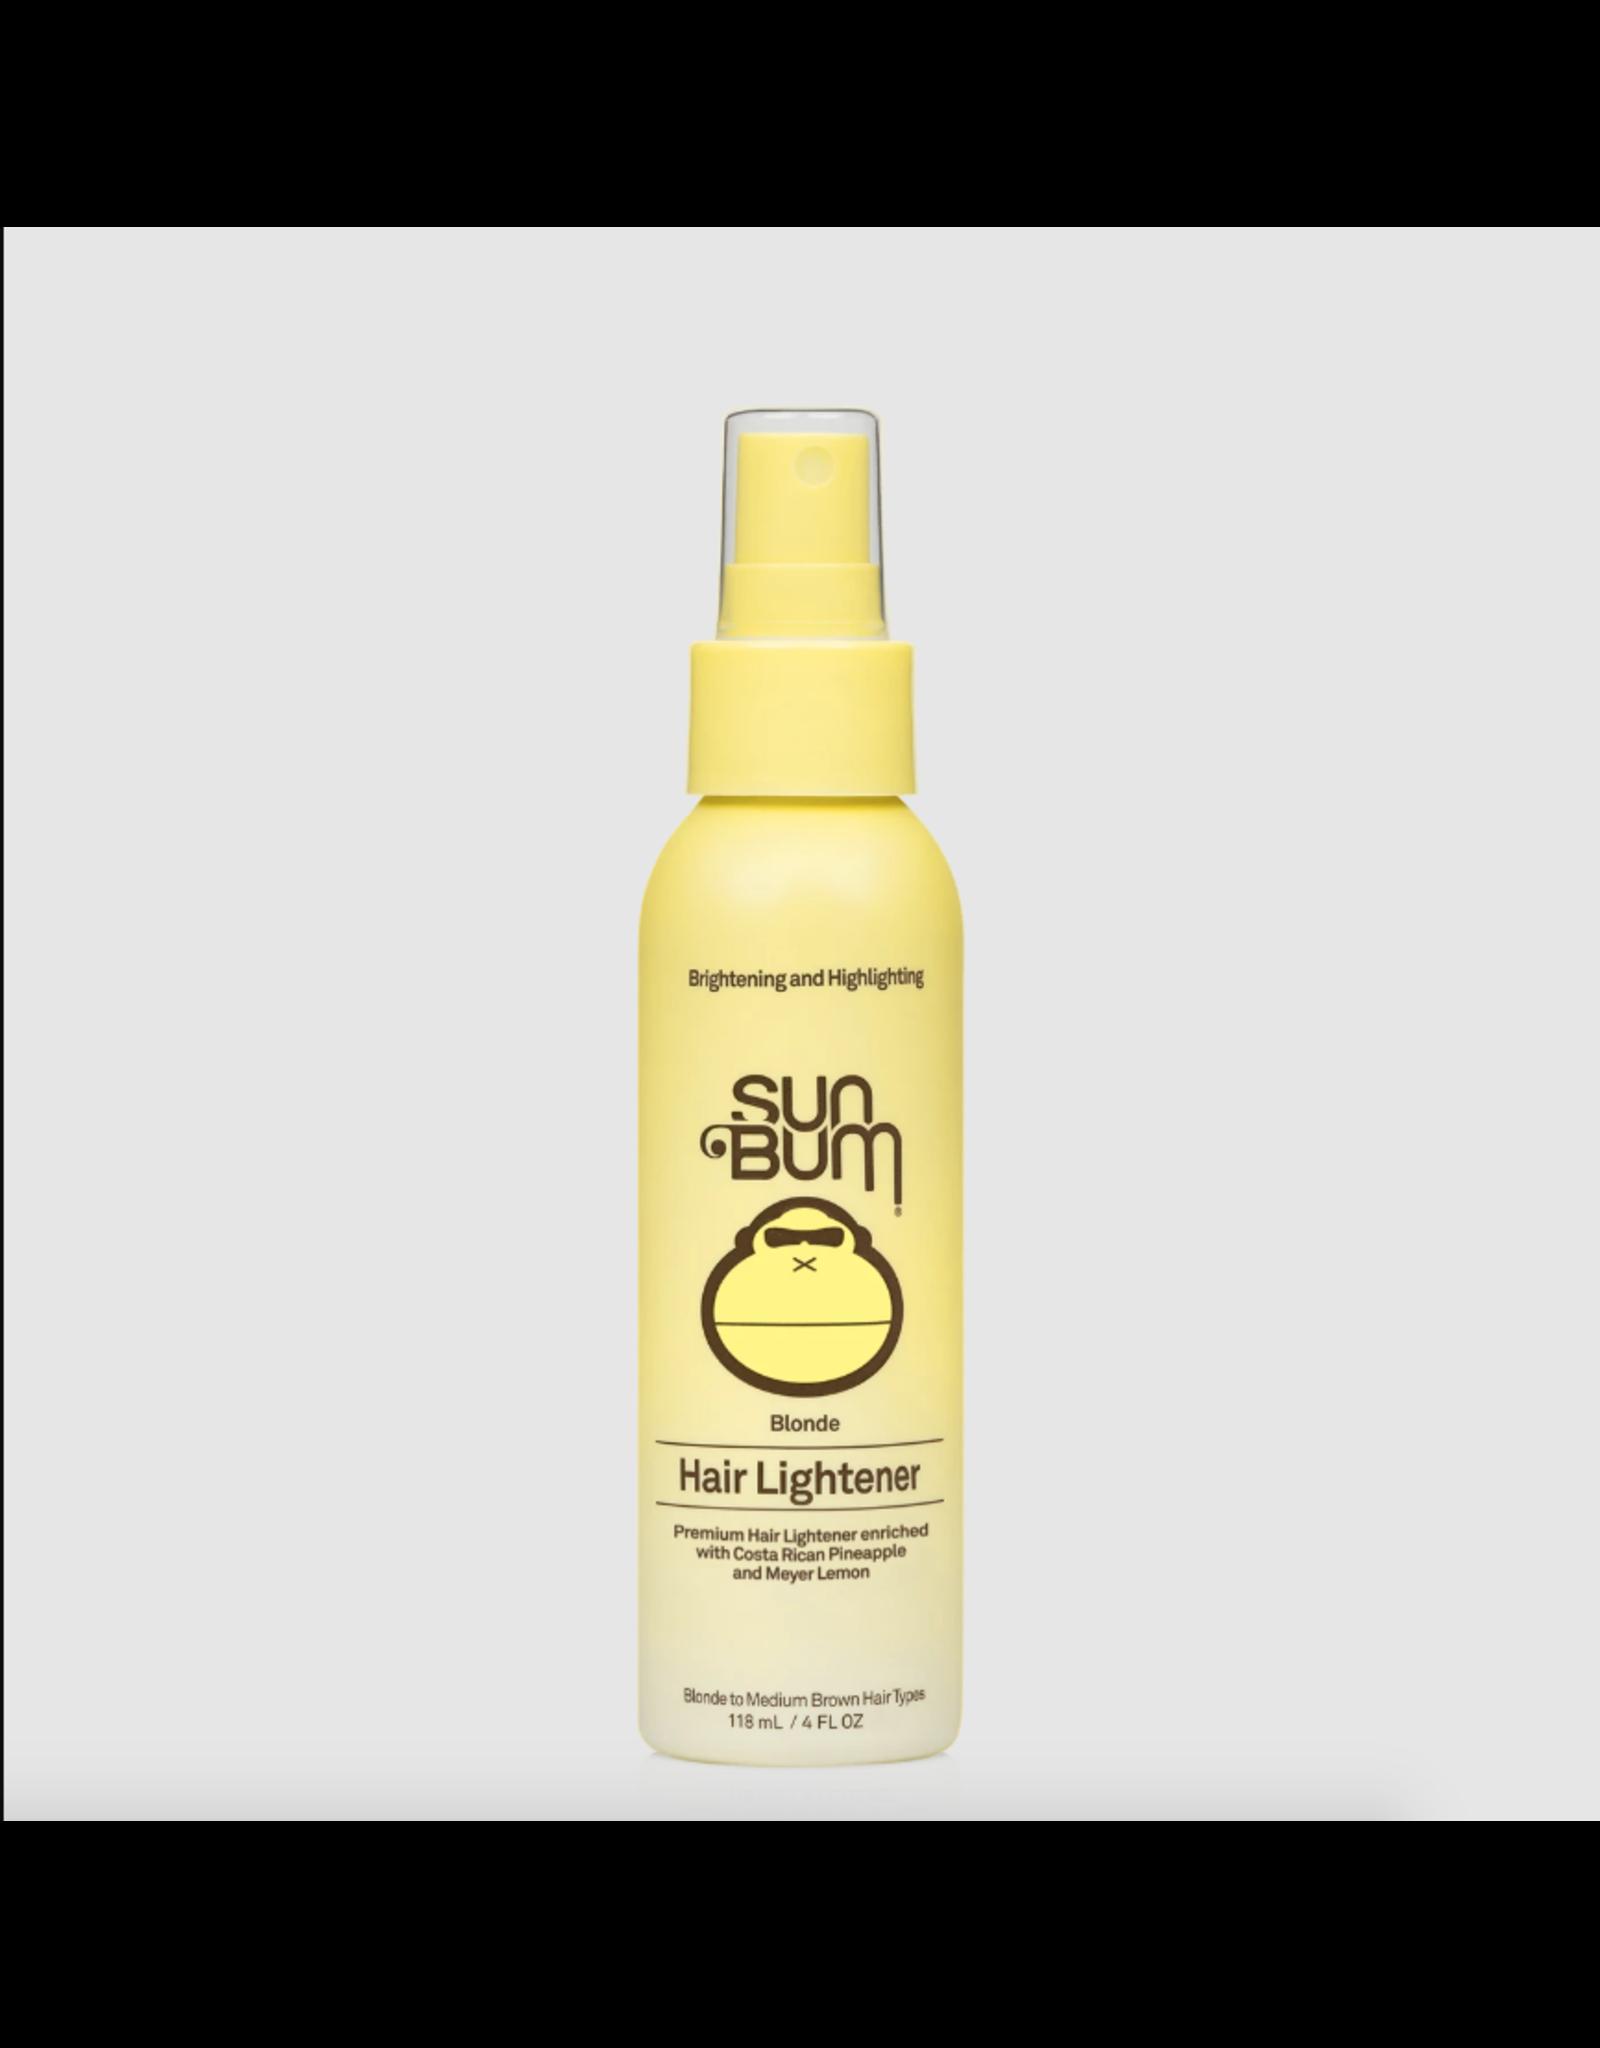 SUN BUM Blonde Hair Lightener